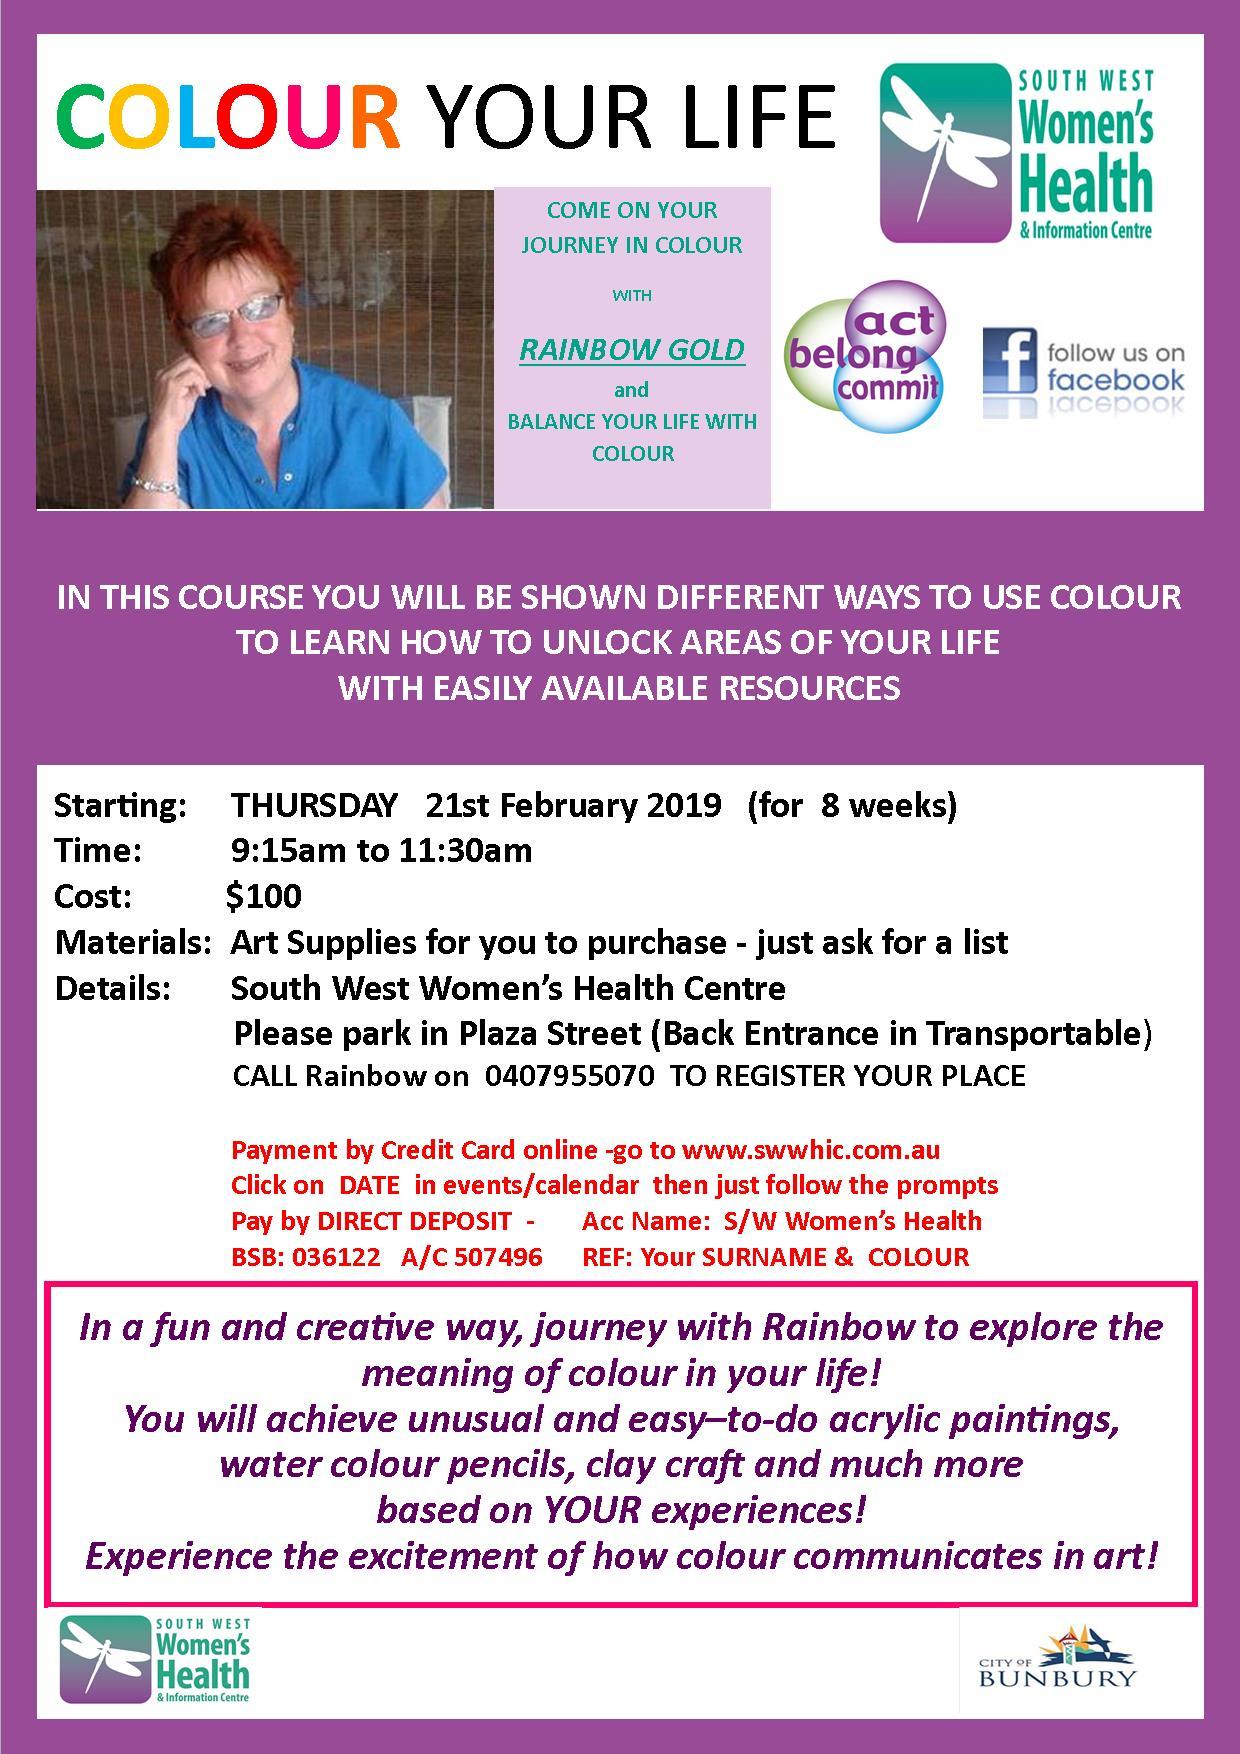 Colour Your Life Art Class Flyer